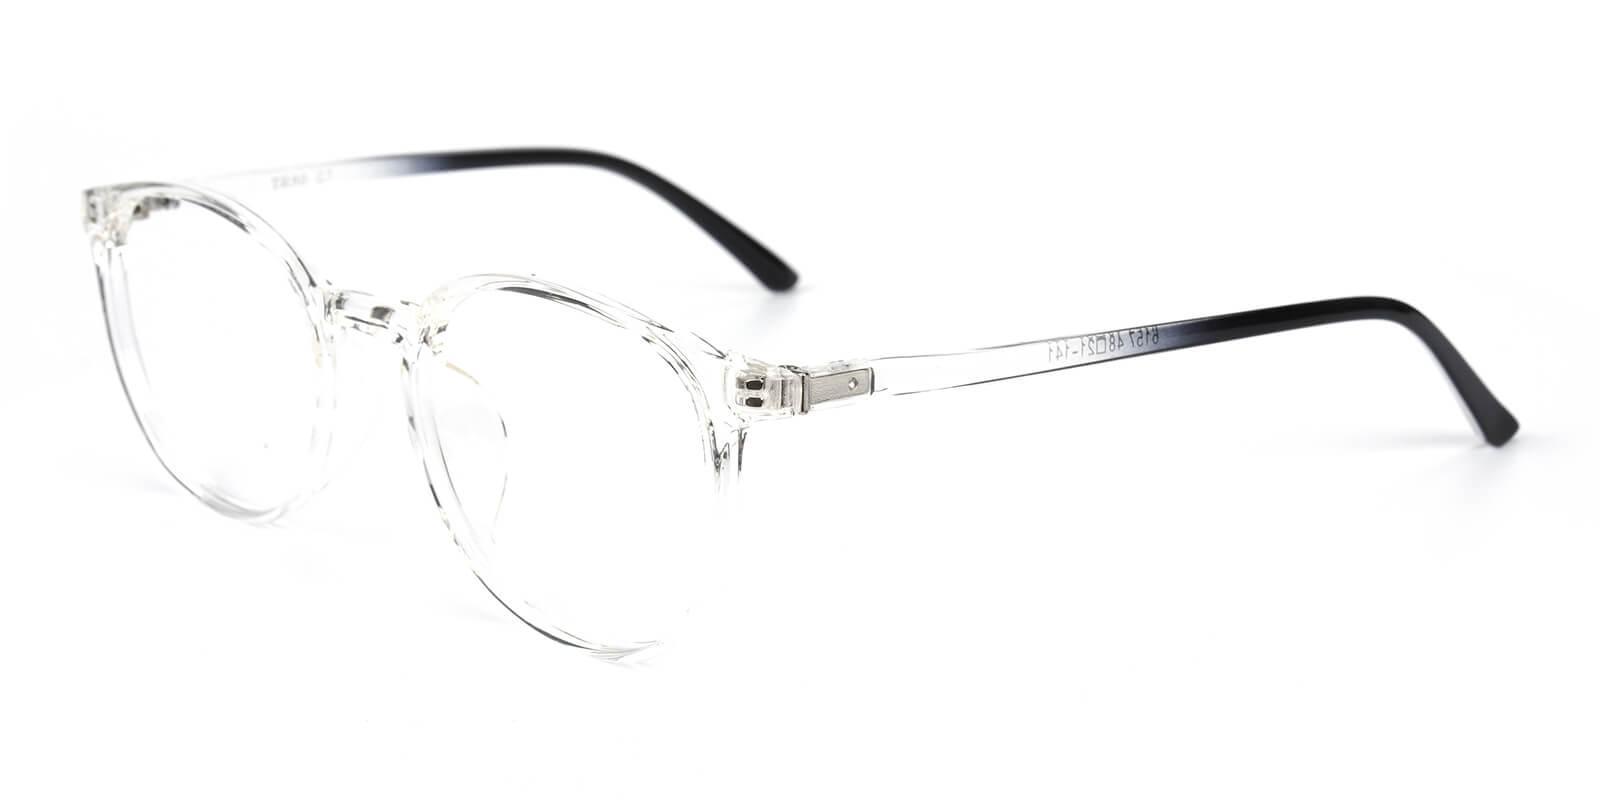 Aure-Translucent-Round-TR-Eyeglasses-detail